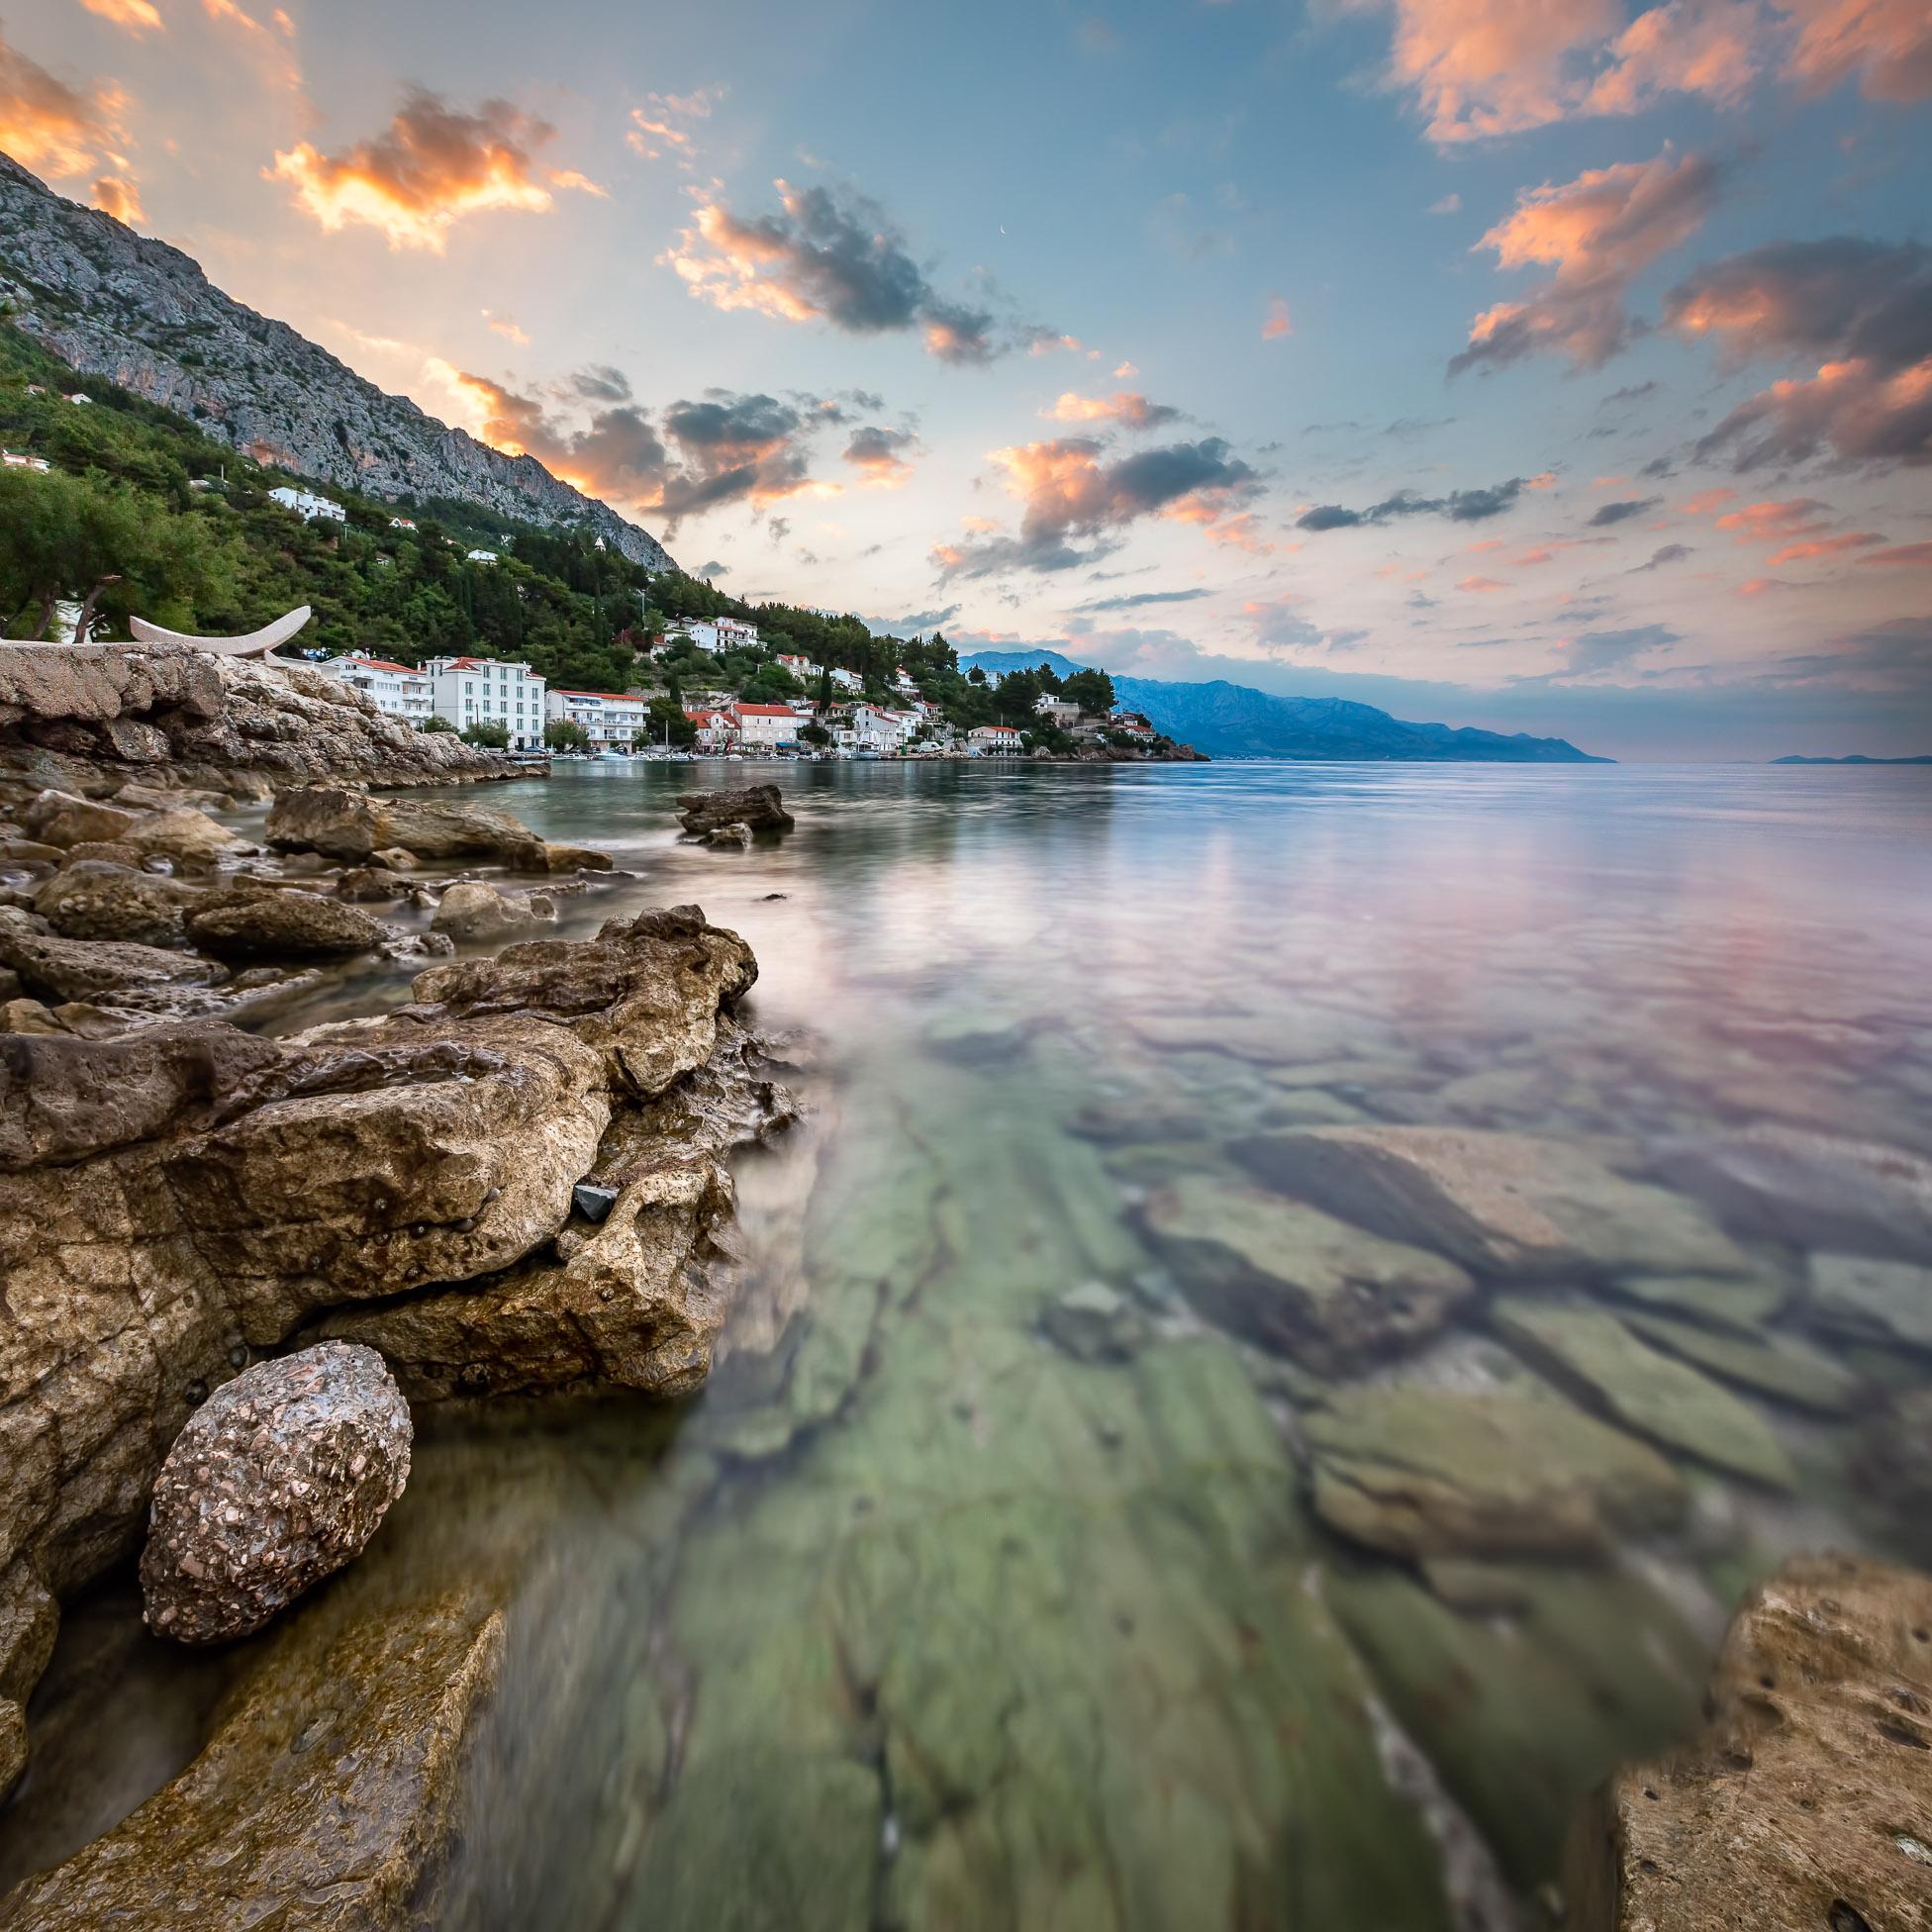 Sunrise on Rocky Beach and Small Village near Omis, Dalmatia, Croatia